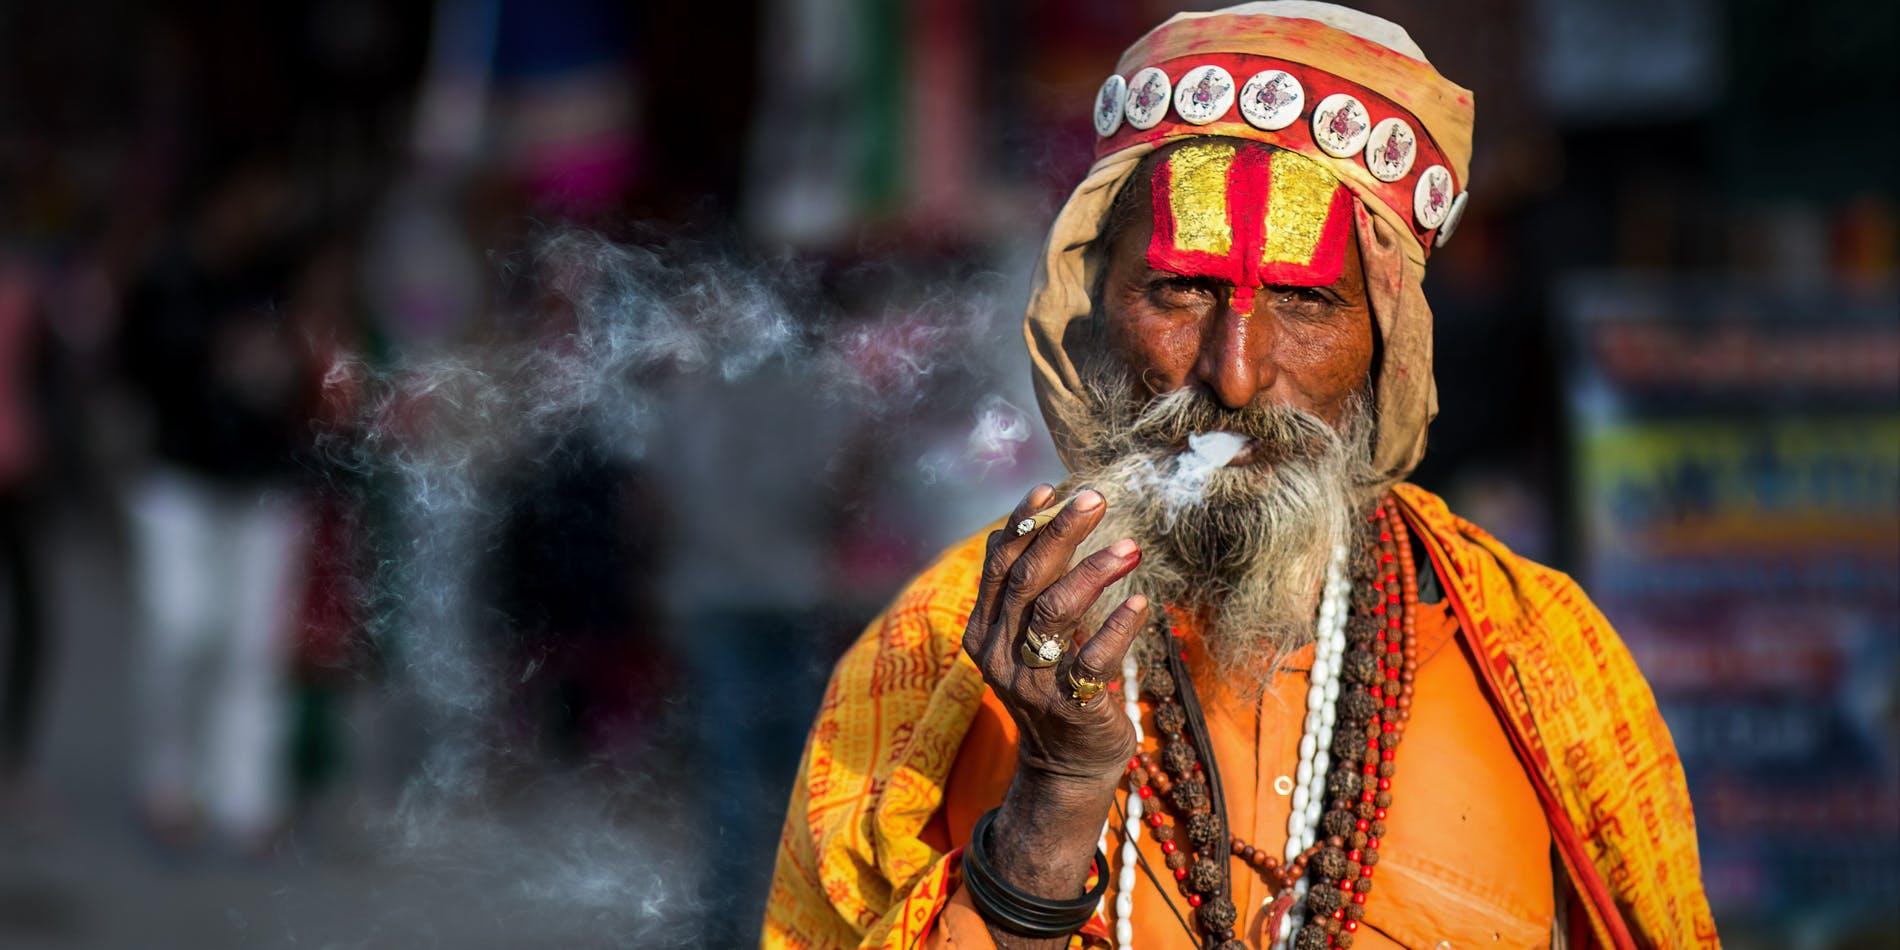 An Indian baba having a smoke of Hindu Kush